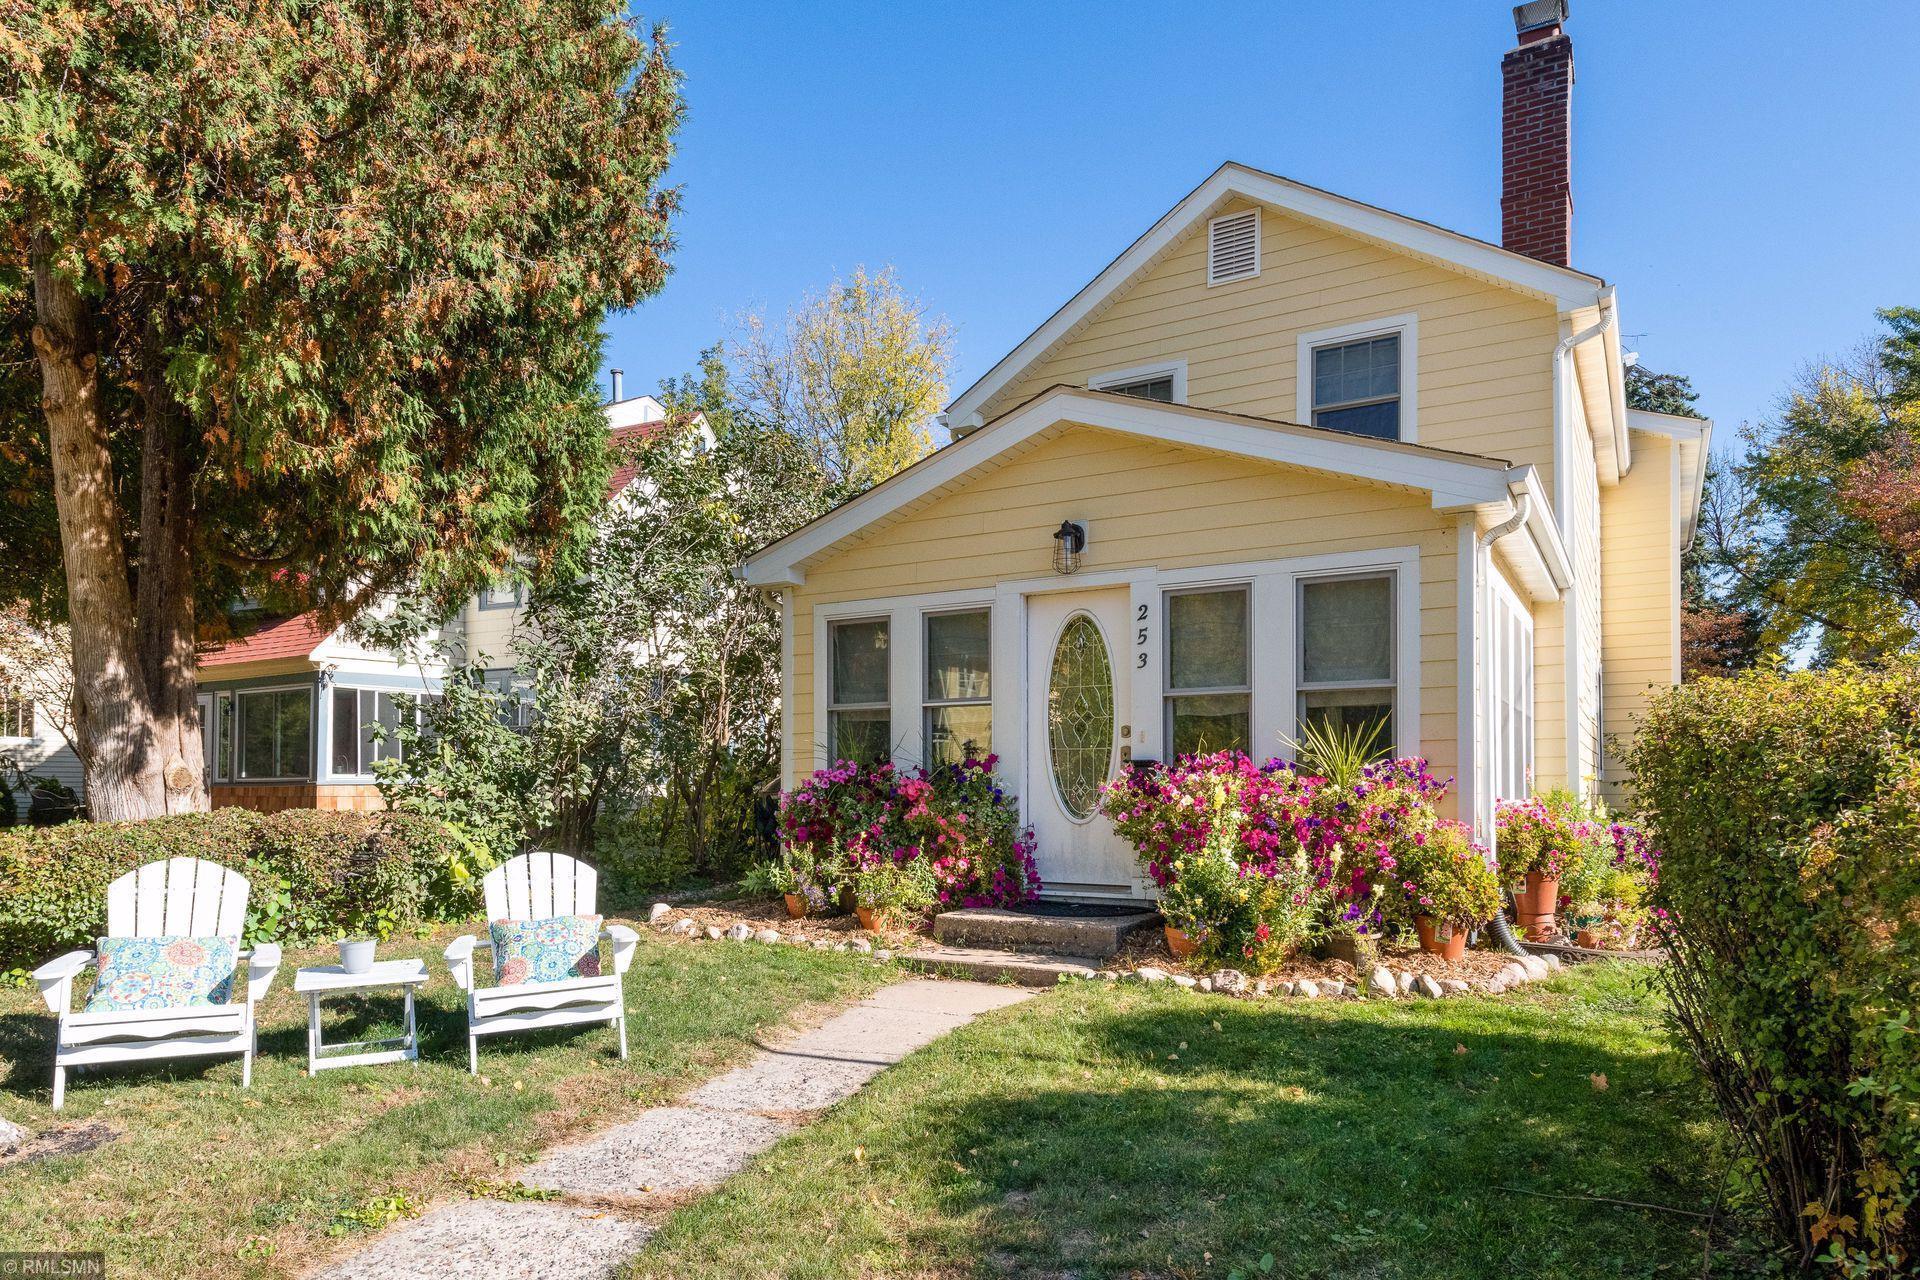 253 1st Street Property Photo - Excelsior, MN real estate listing